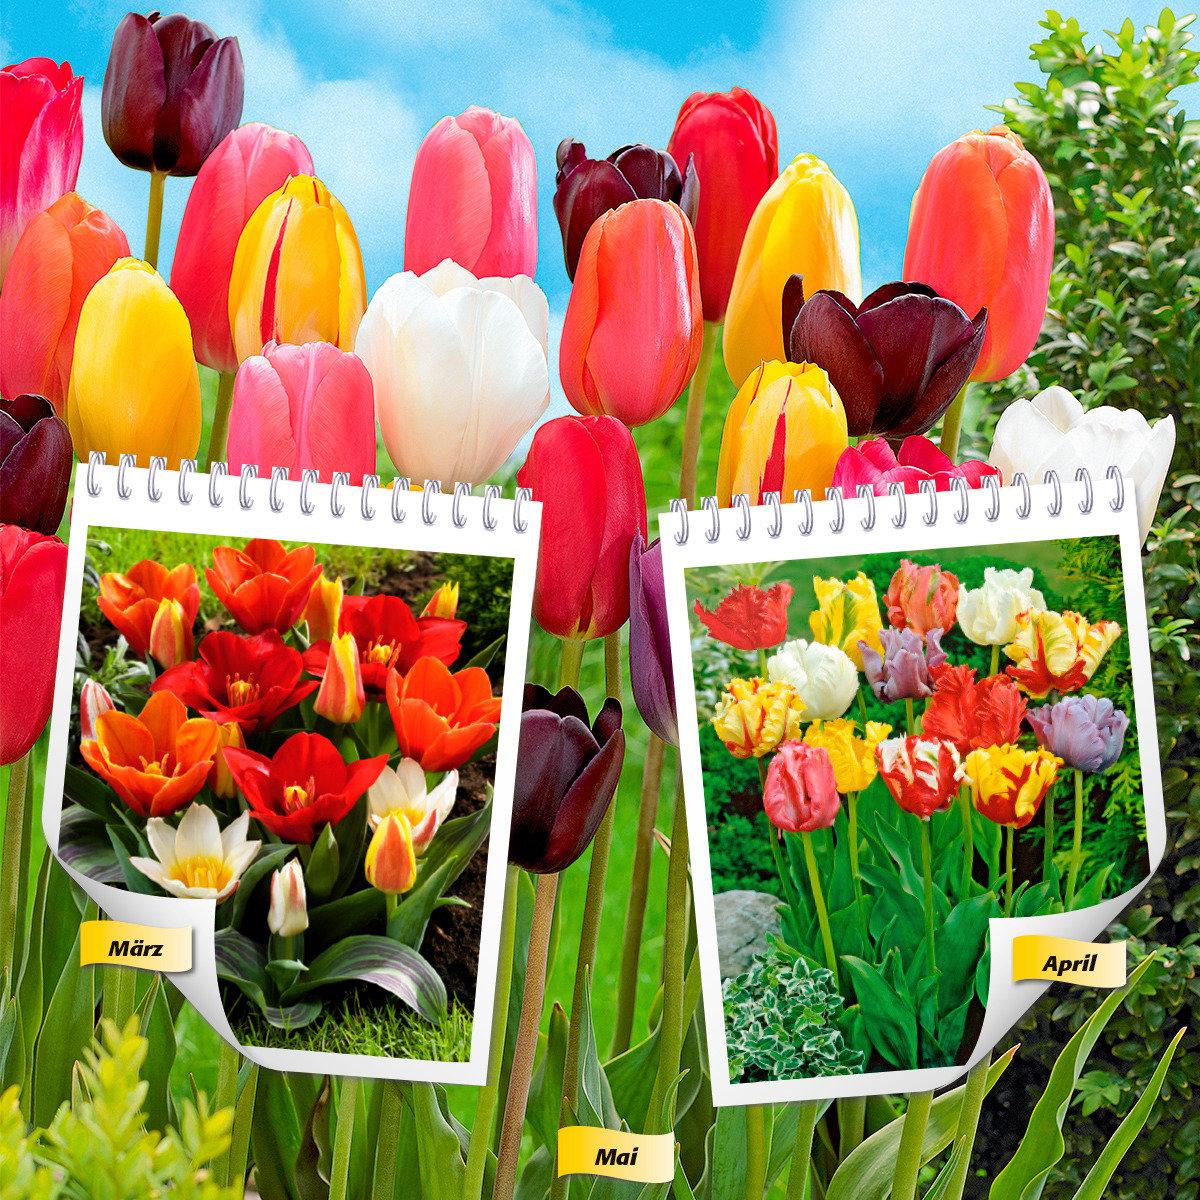 Blumenzwiebel-Sortiment 12 Wochen Tulpen-Blüte